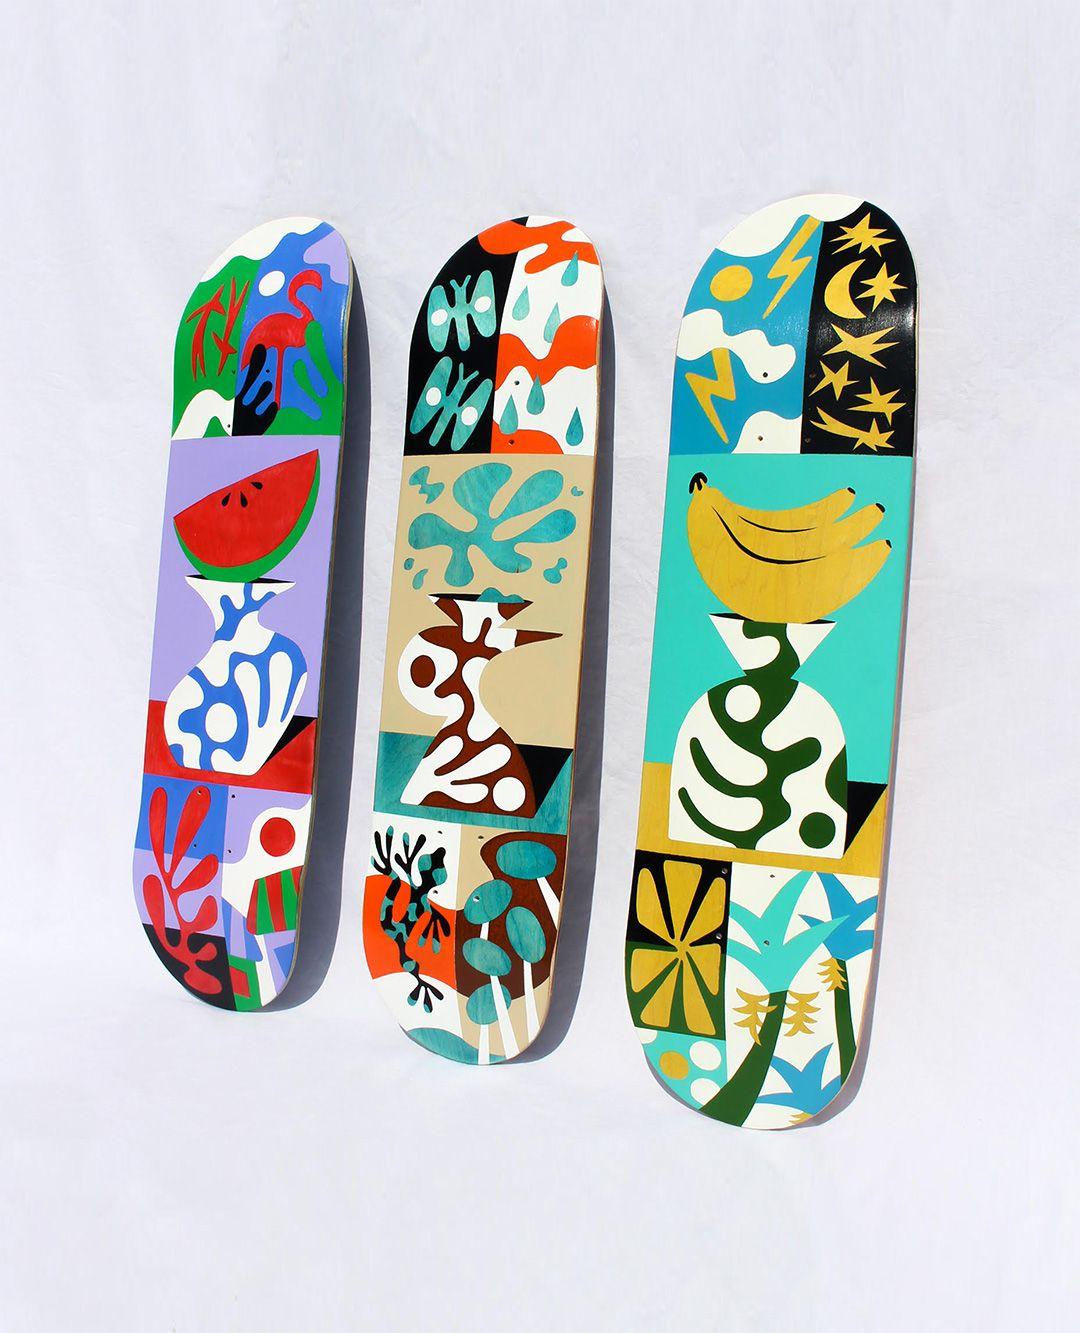 Custom Skateboards By Bart Lanzini For The European Custom Board Show 8